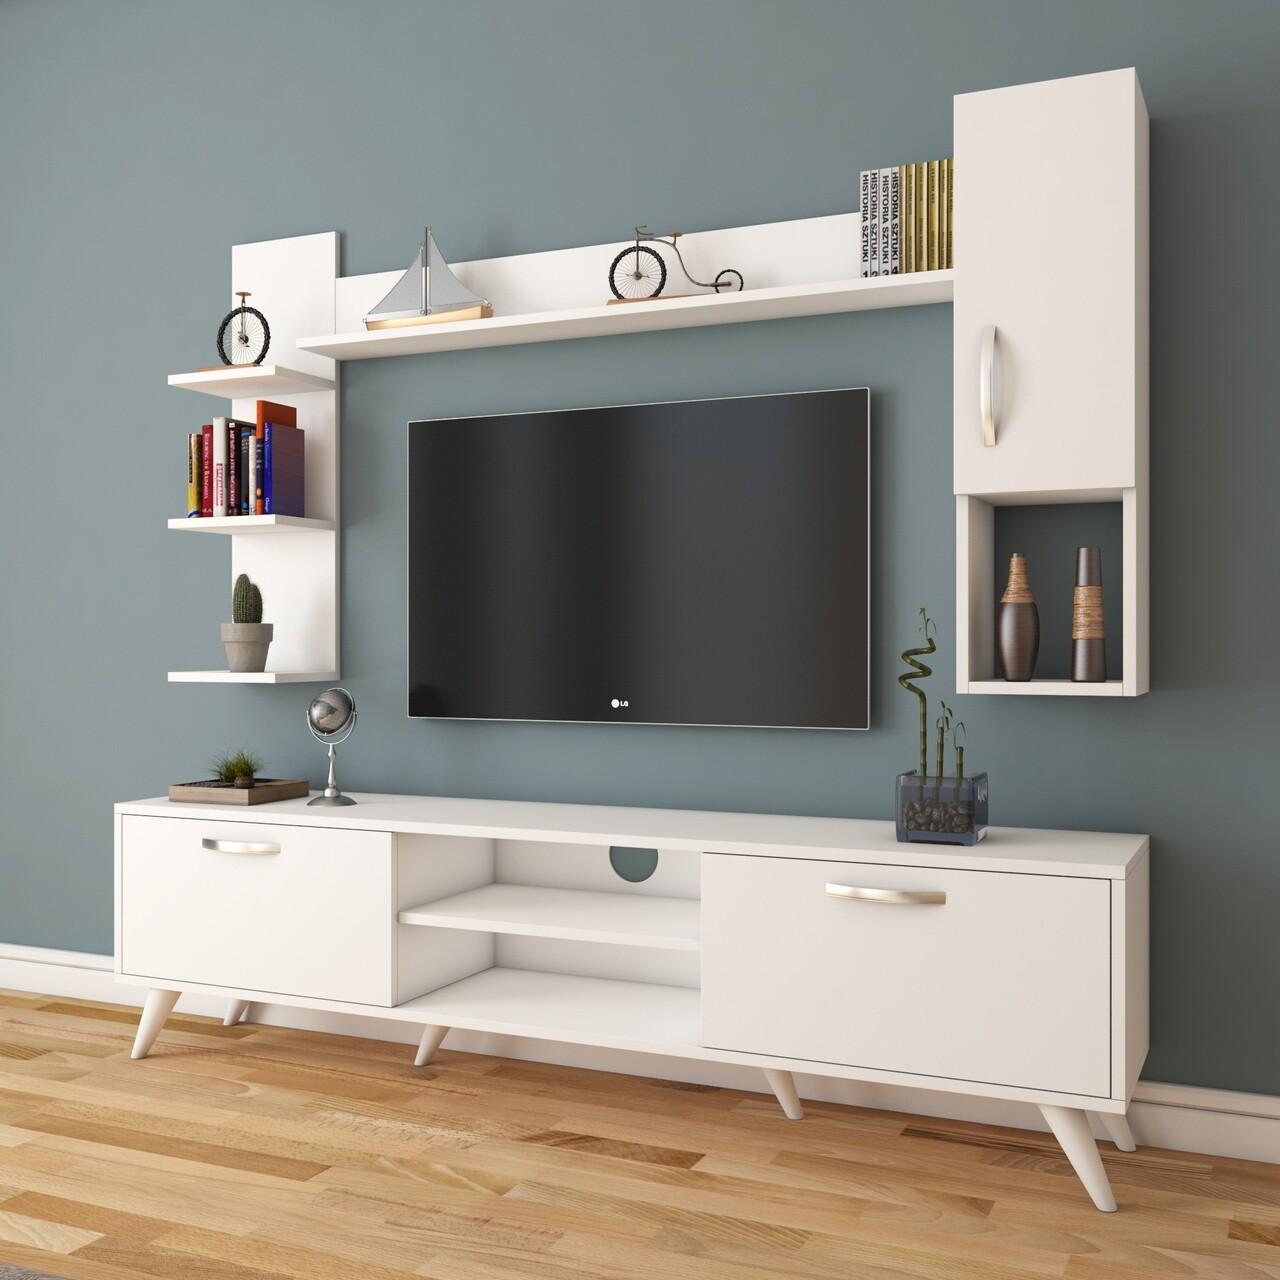 Comoda TV cu 2 rafturi de perete si cabinet M25 - 279, Wren, 180 x 35 x 48.6 cm/90 cm/133 cm, white